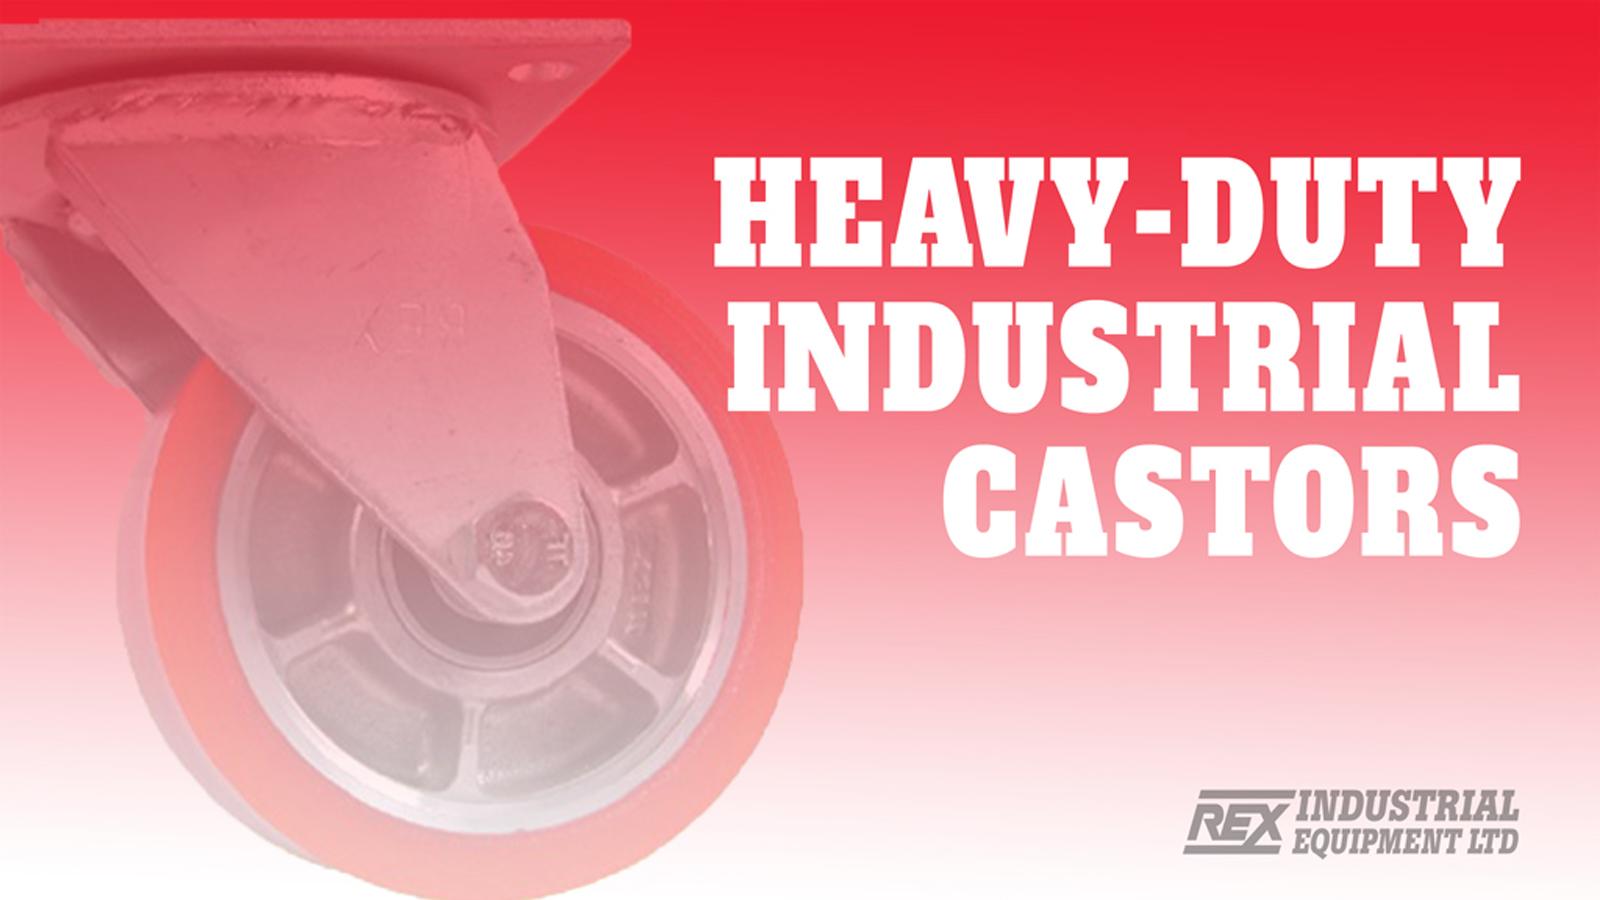 Heavy-Duty-Castors-Banner-1600-x-900